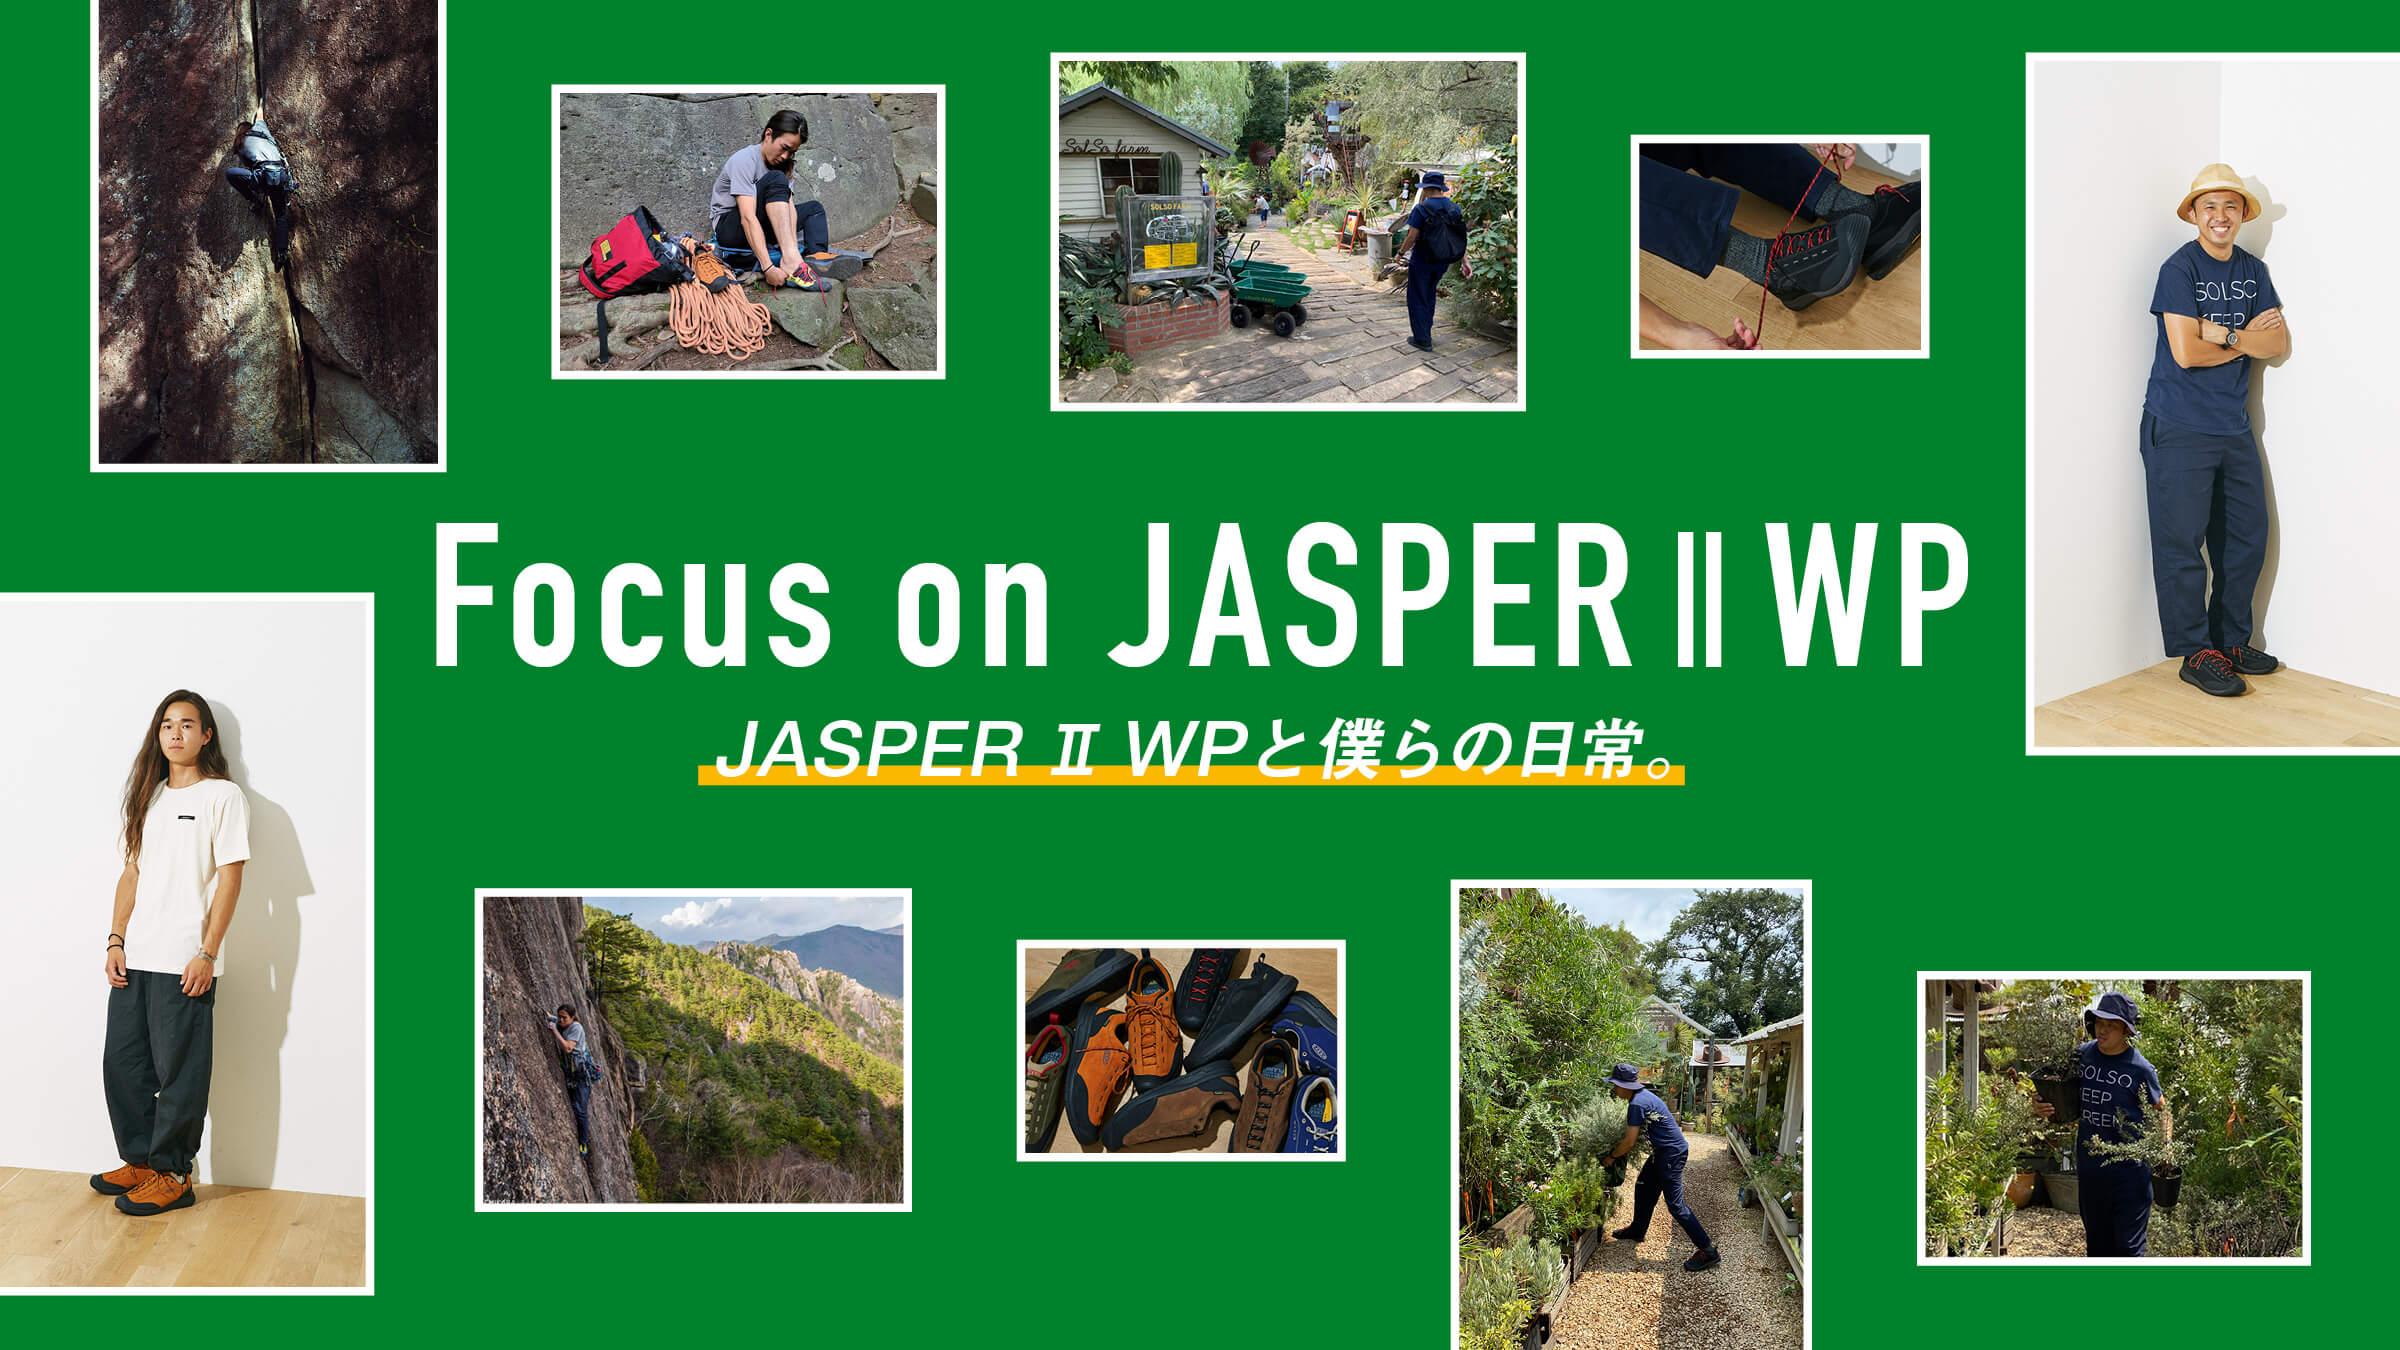 JASPERⅡWPと僕らの日常。